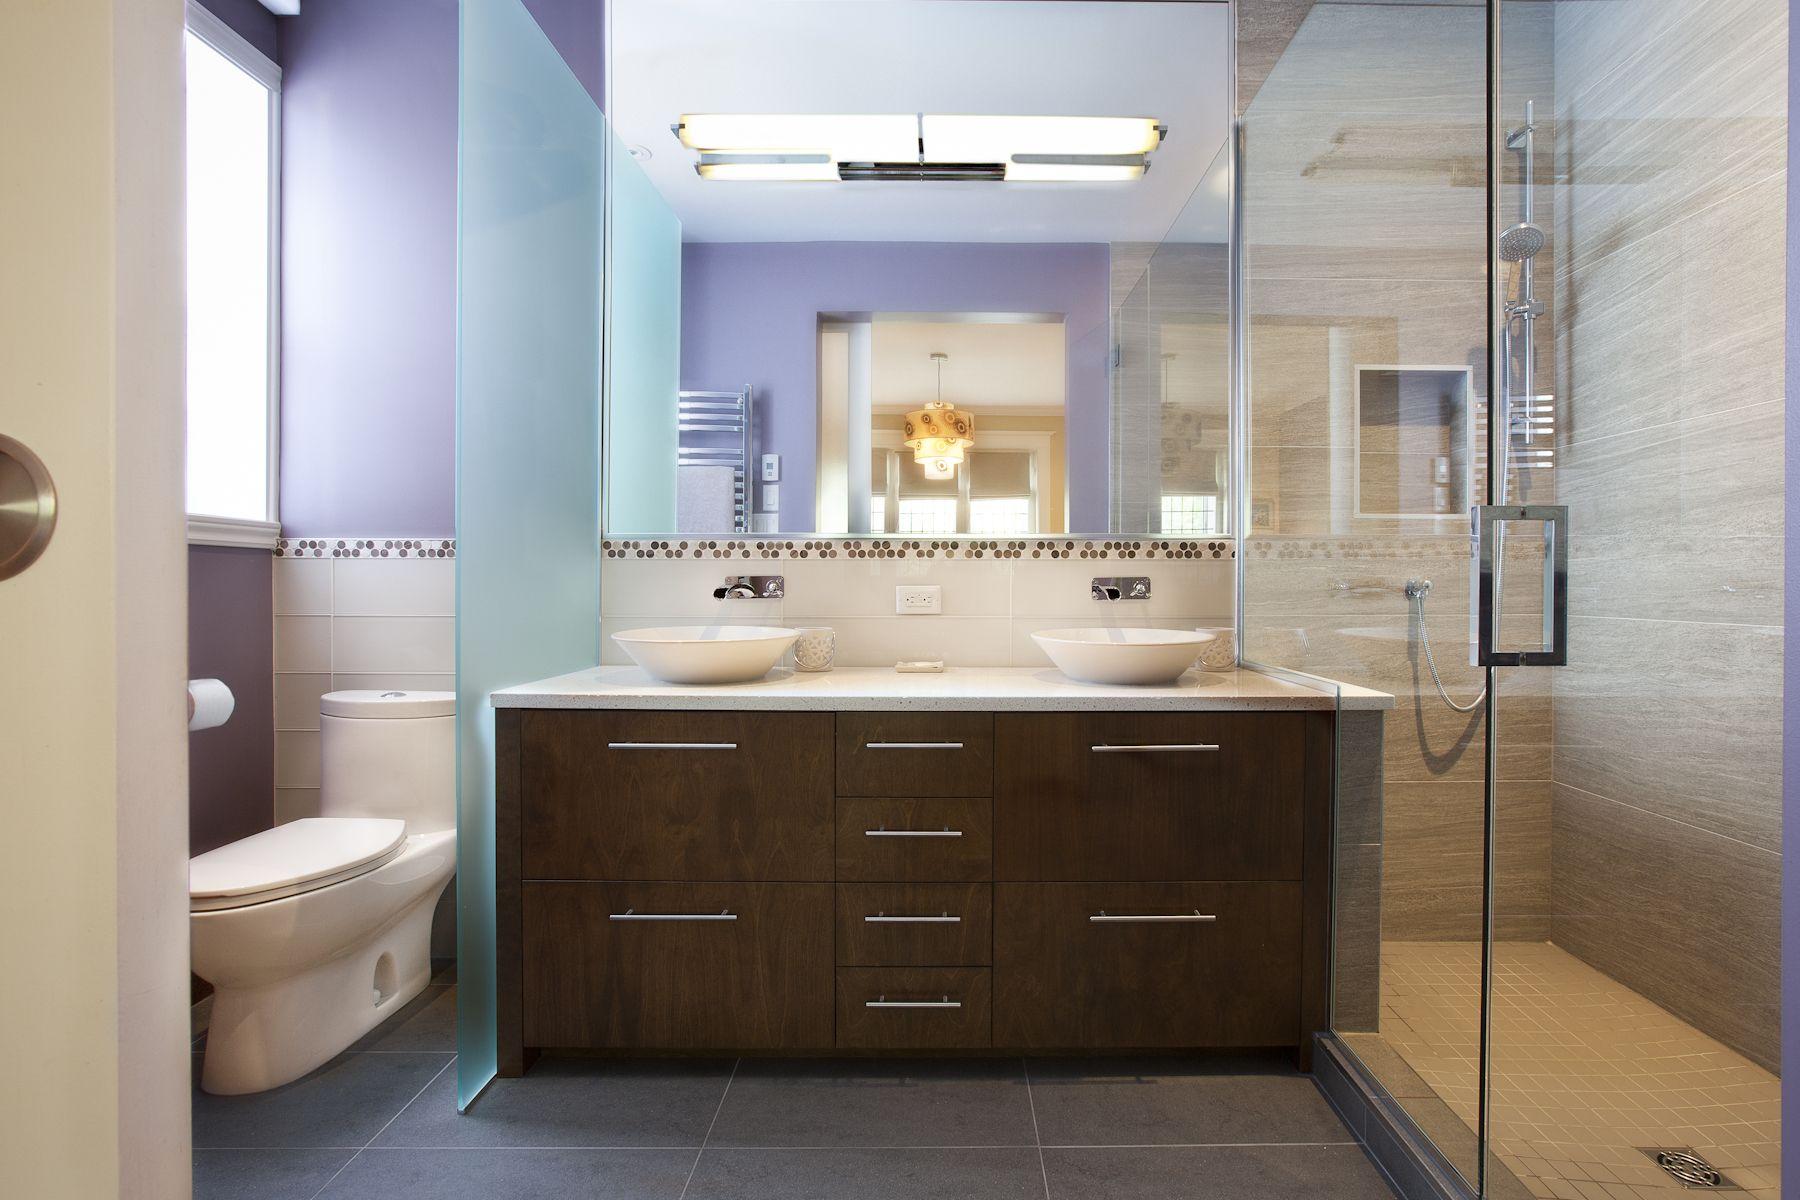 Salle De Bain Bathroom Groupe Sp R No Urbaine Salle De Bain